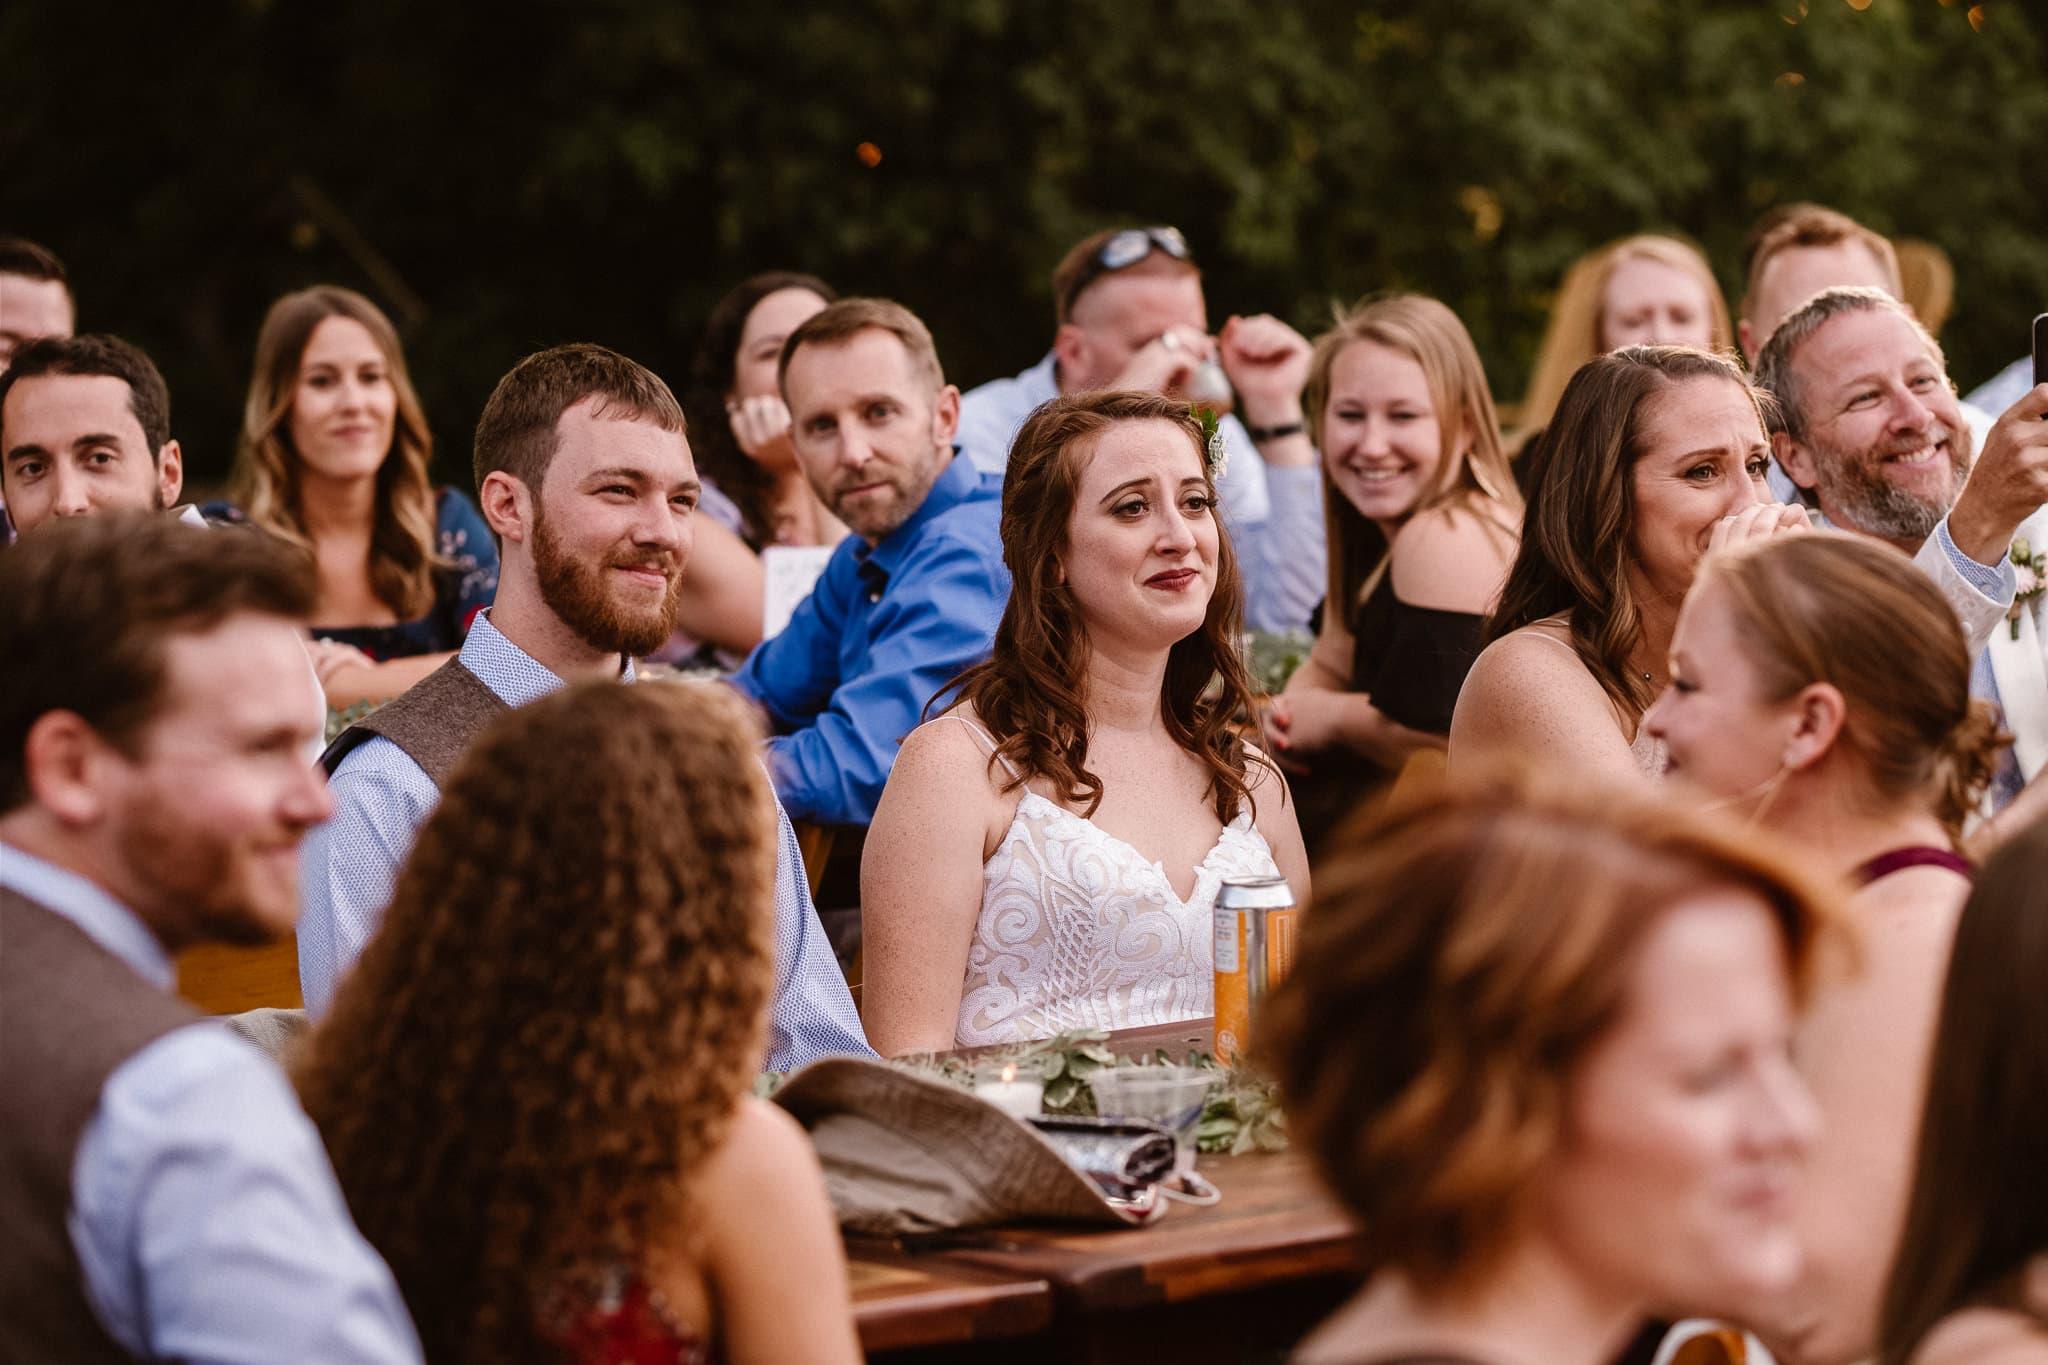 Lyons Farmette wedding photographer, Colorado intimate wedding photographer, cocktail hour photos, welcome toast